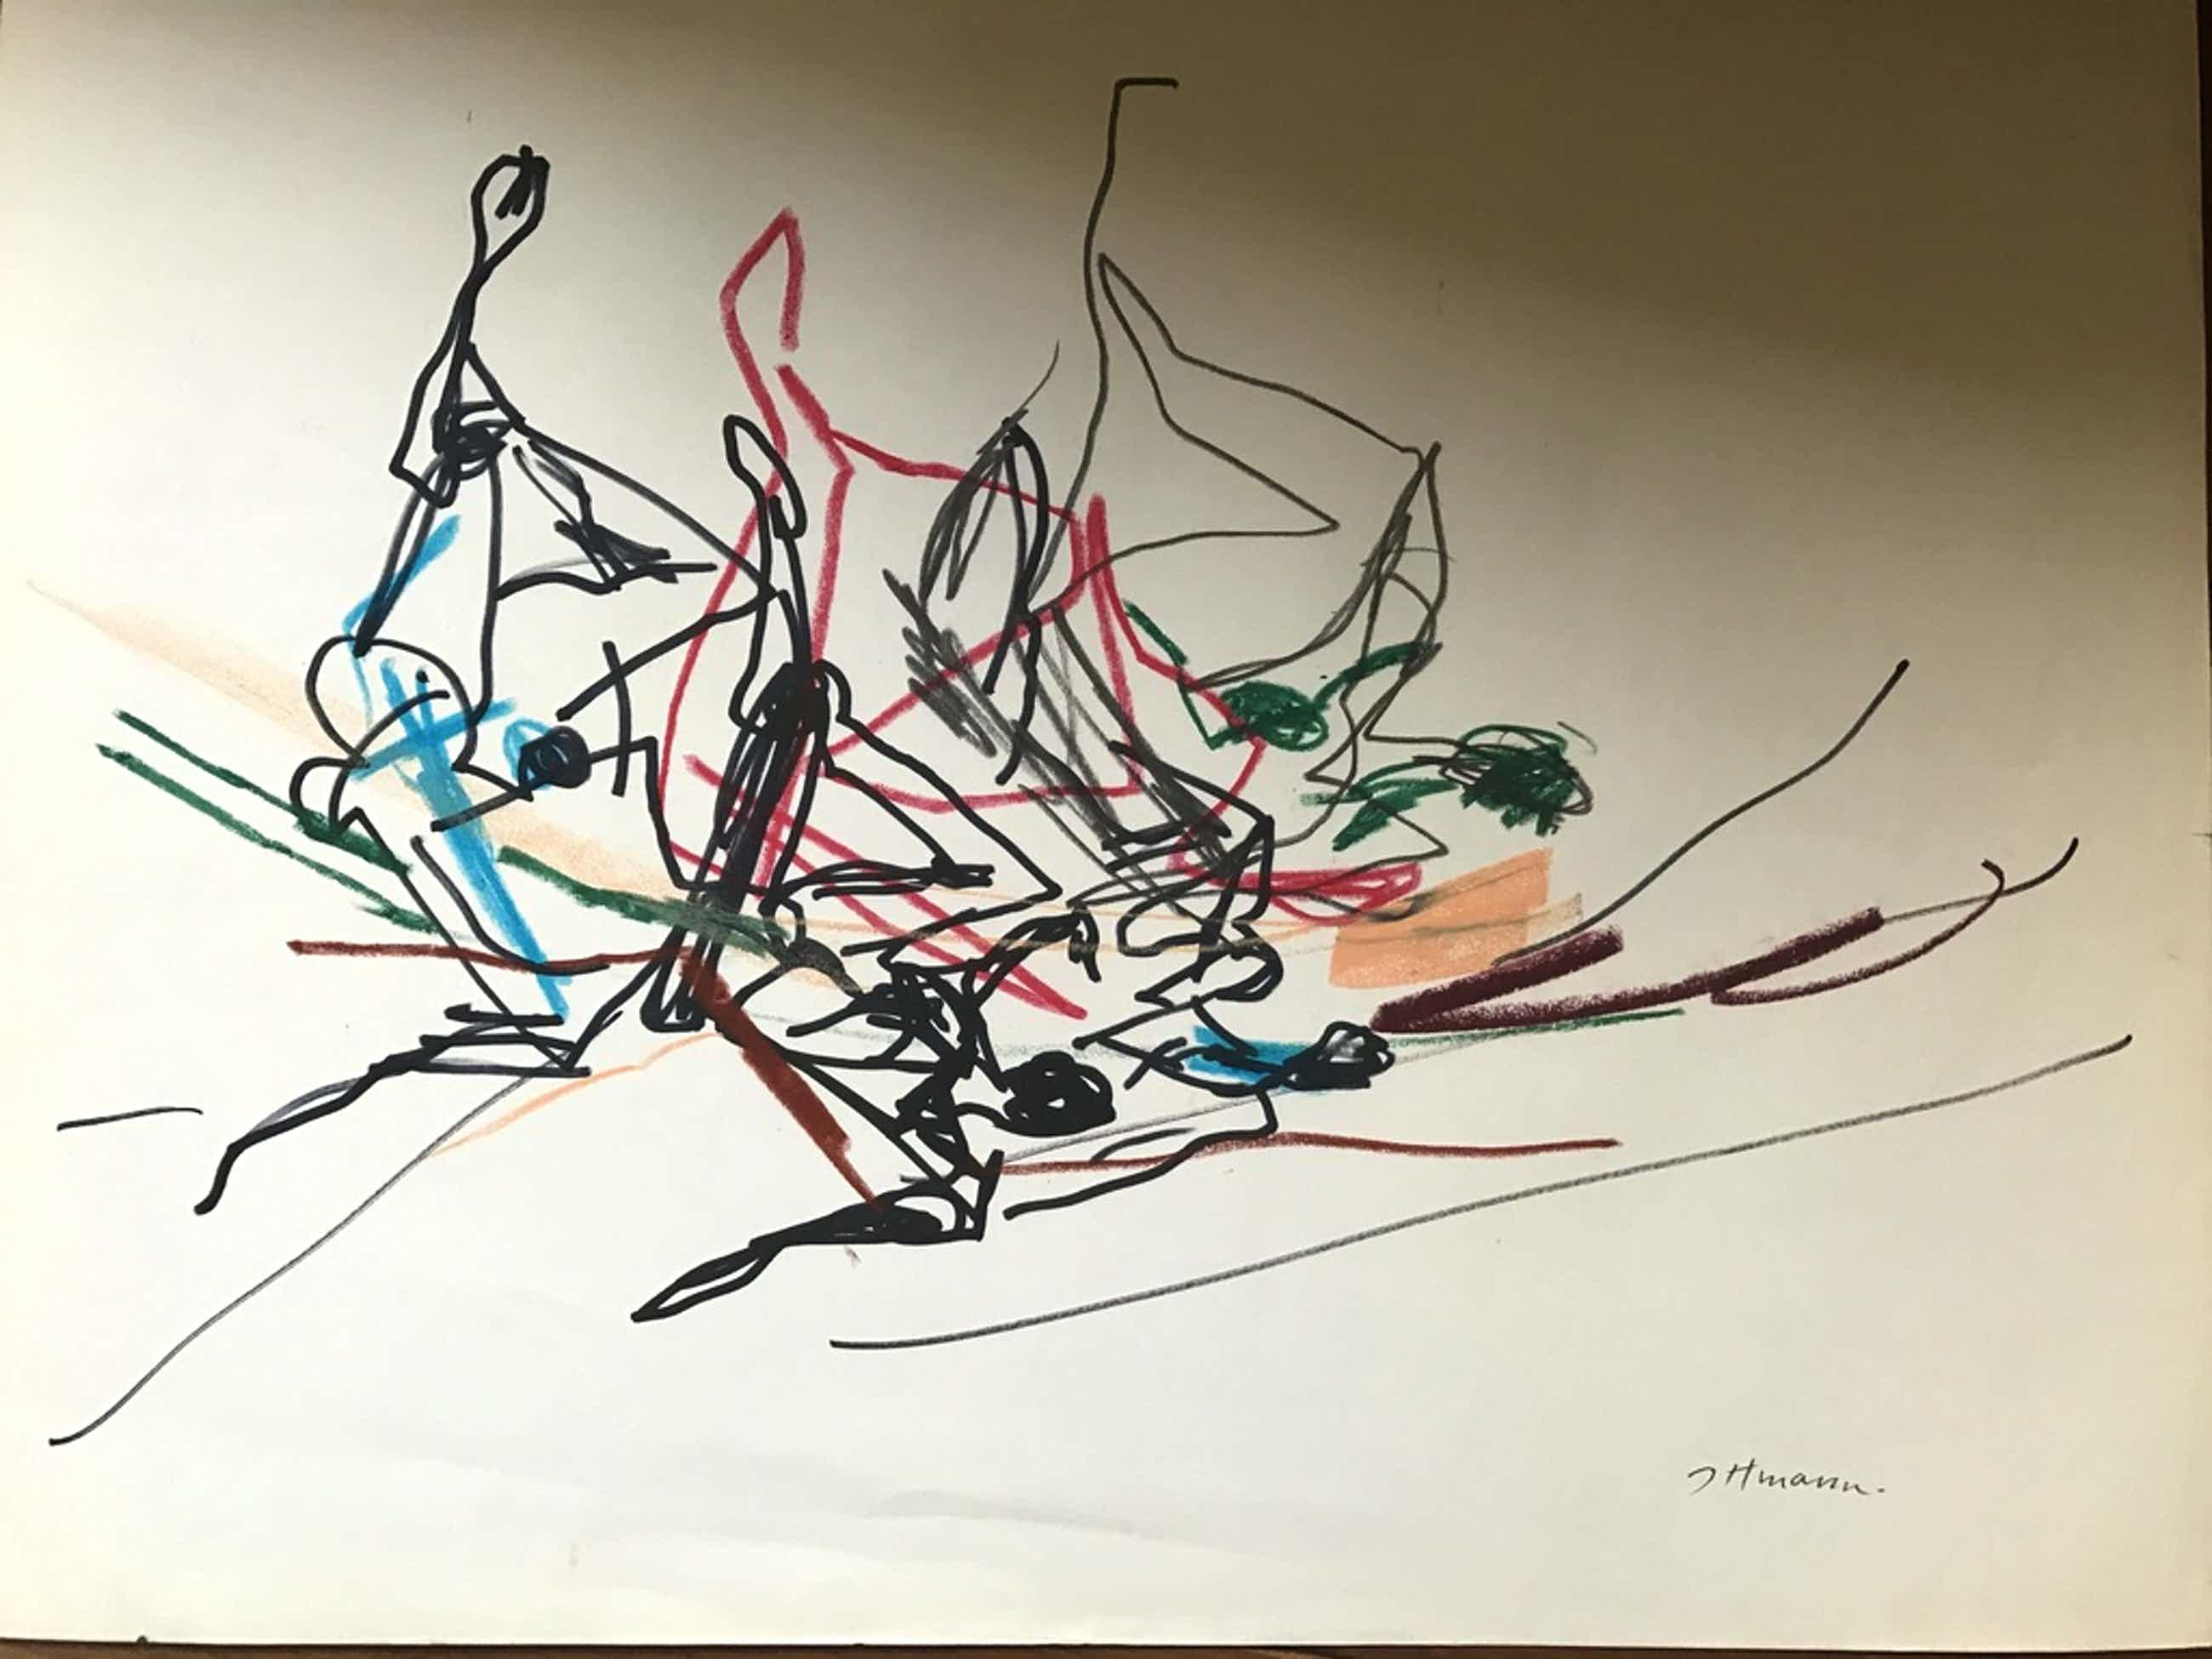 Hans ittmann aquarel moderne compositie  kopen? Bied vanaf 40!